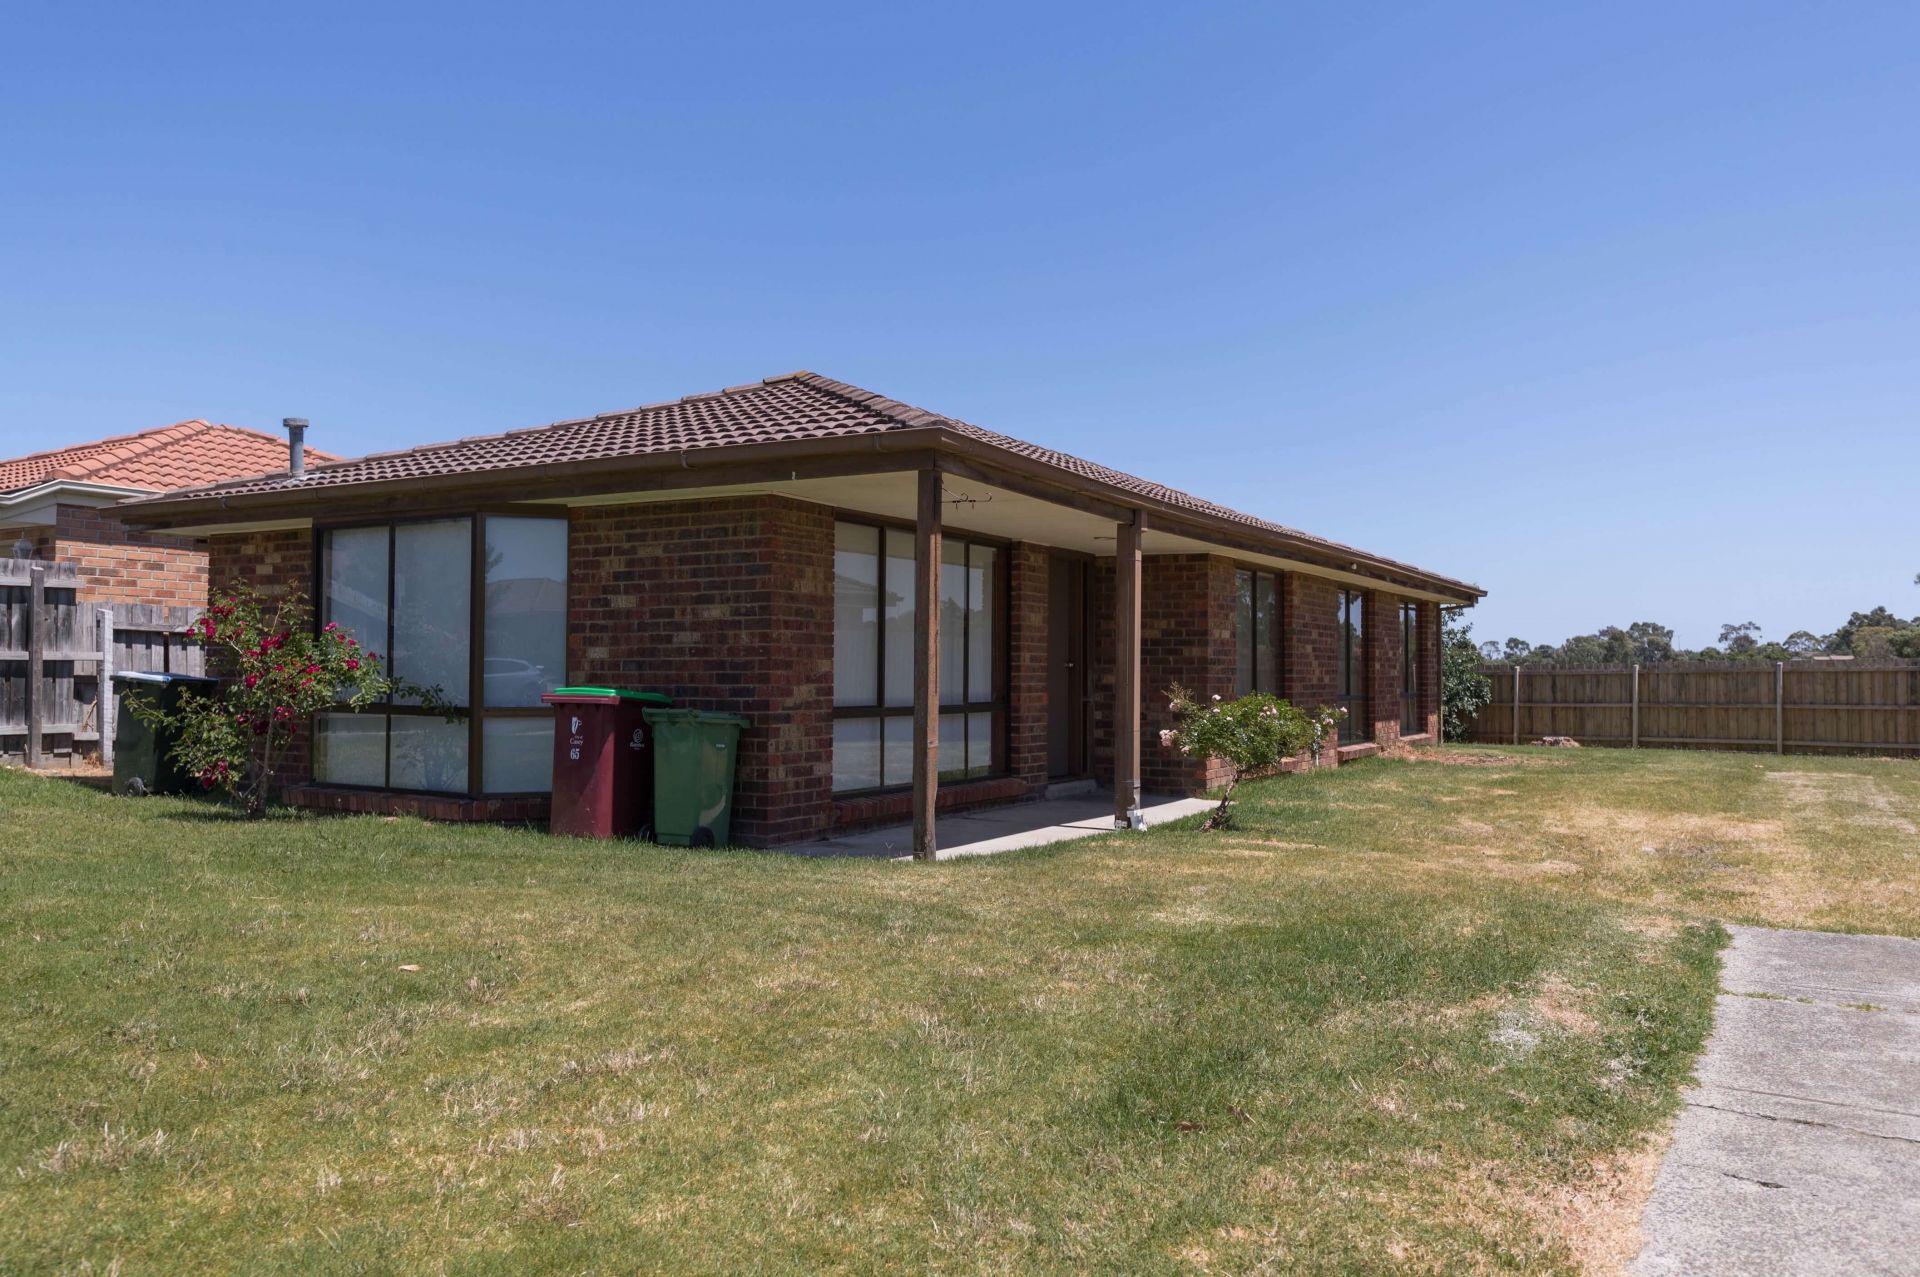 Photo of 65 Kurrajong Road, Narre Warren VIC 3805 Australia